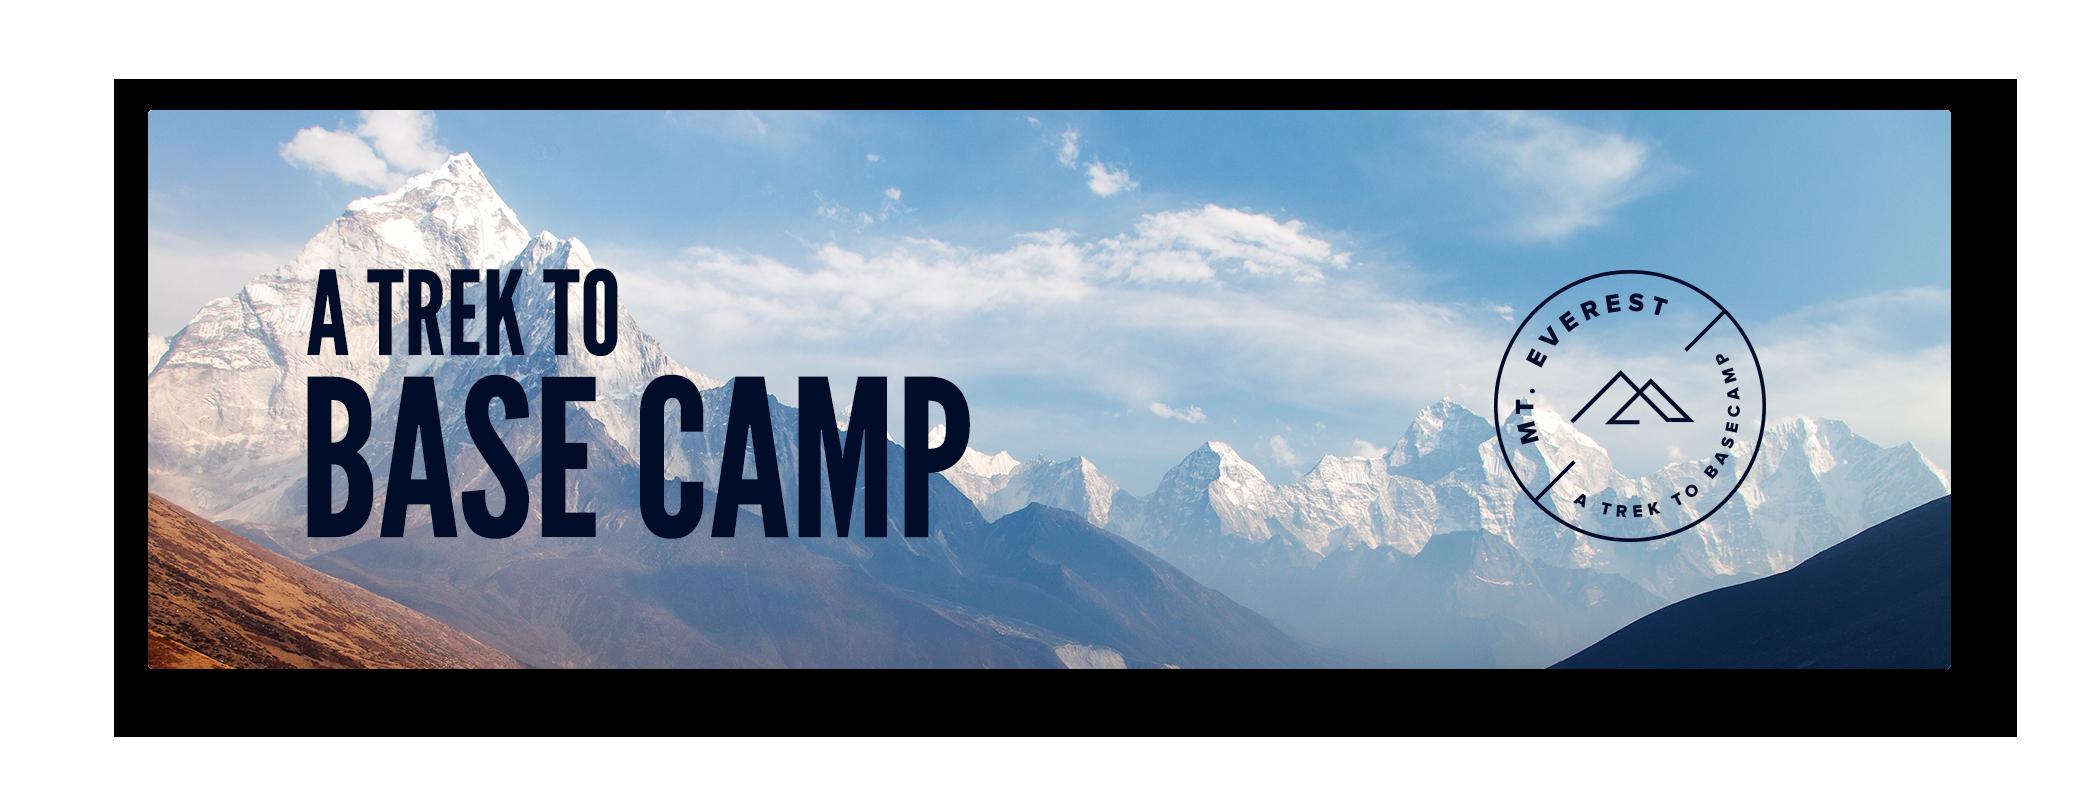 iFit Everest: A Trek to Base Camp Series | Walking workout series